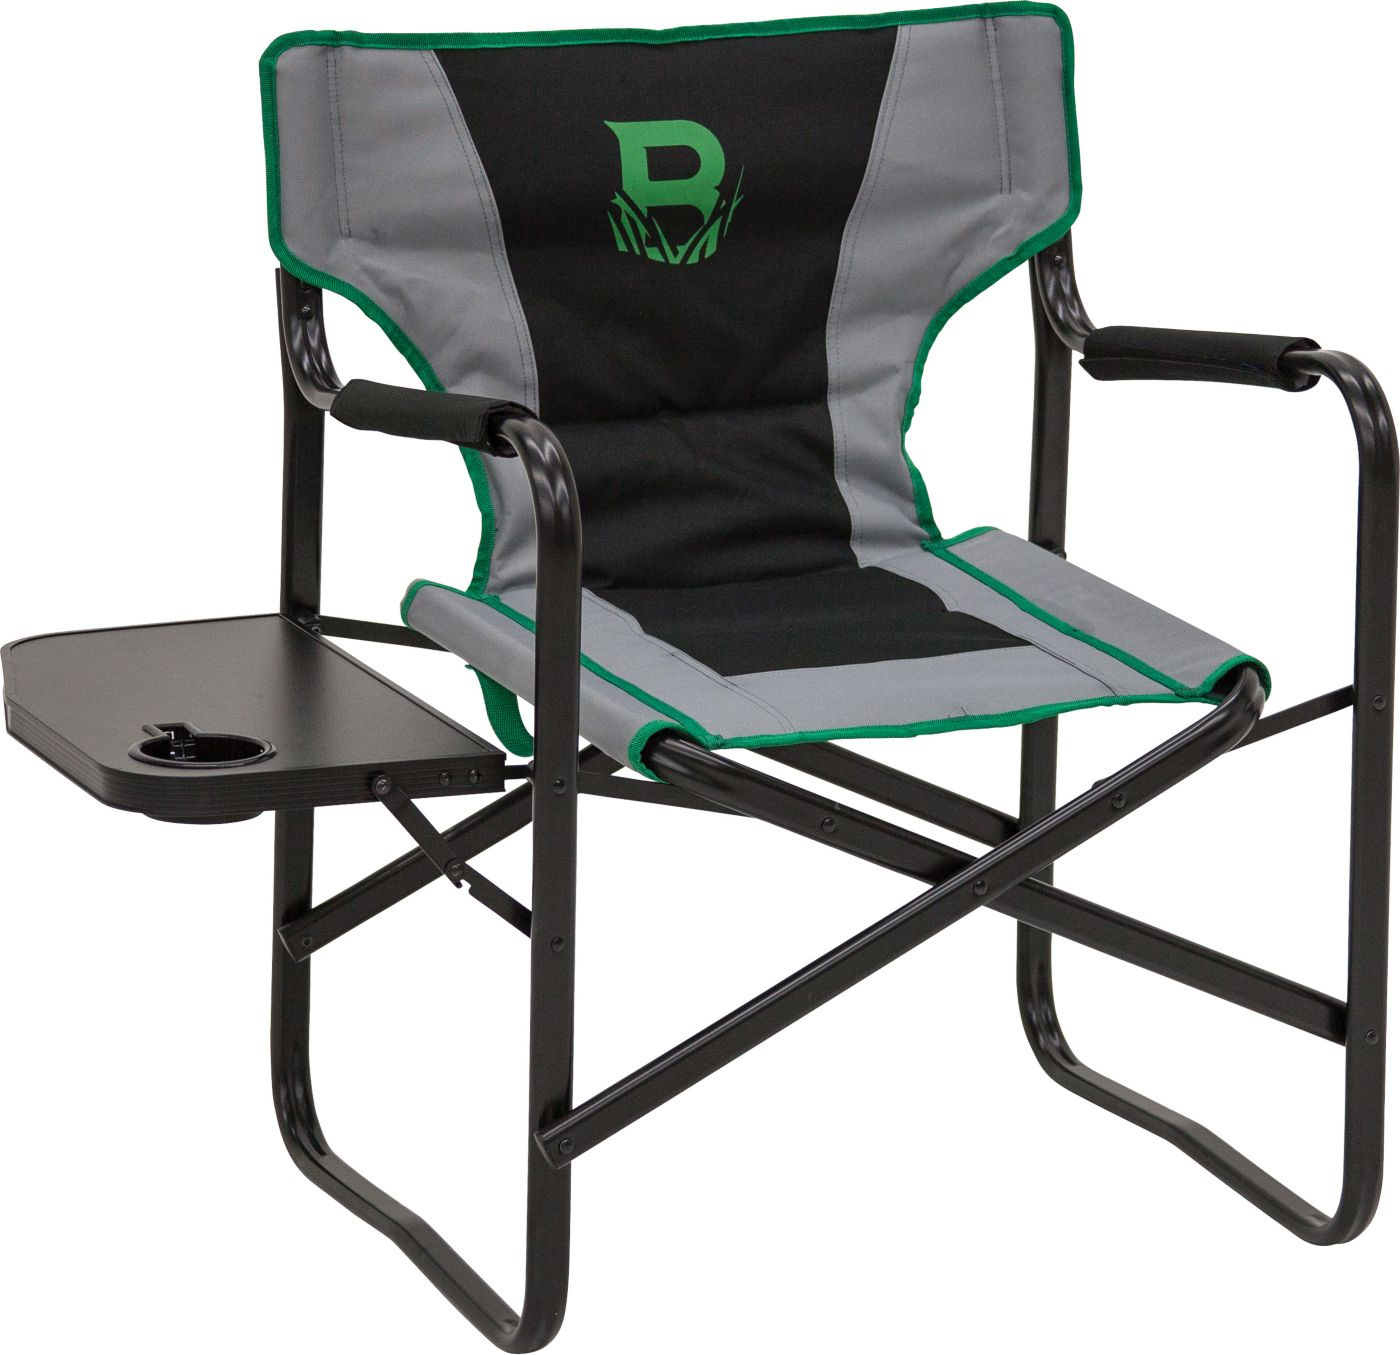 Barronett Blinds Director's Chair w/ Table